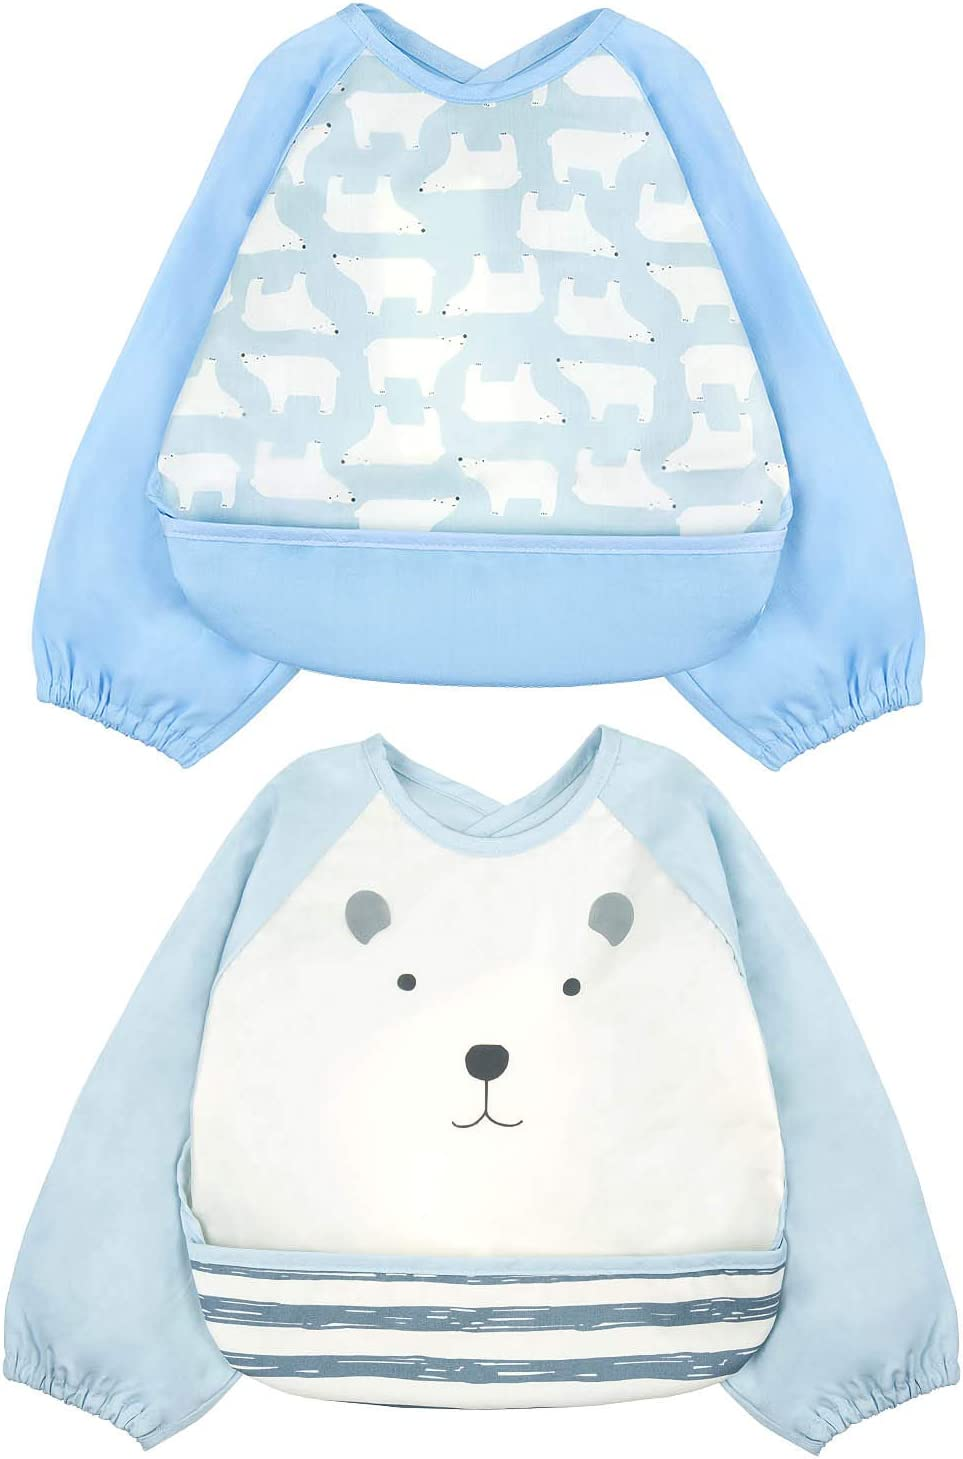 2 PCS Waterproof Unisex Waterproof Long Sleeved Bib for Infant Toddler 6 Months to 3 Years Old ZWOOS Bibs with Sleeves